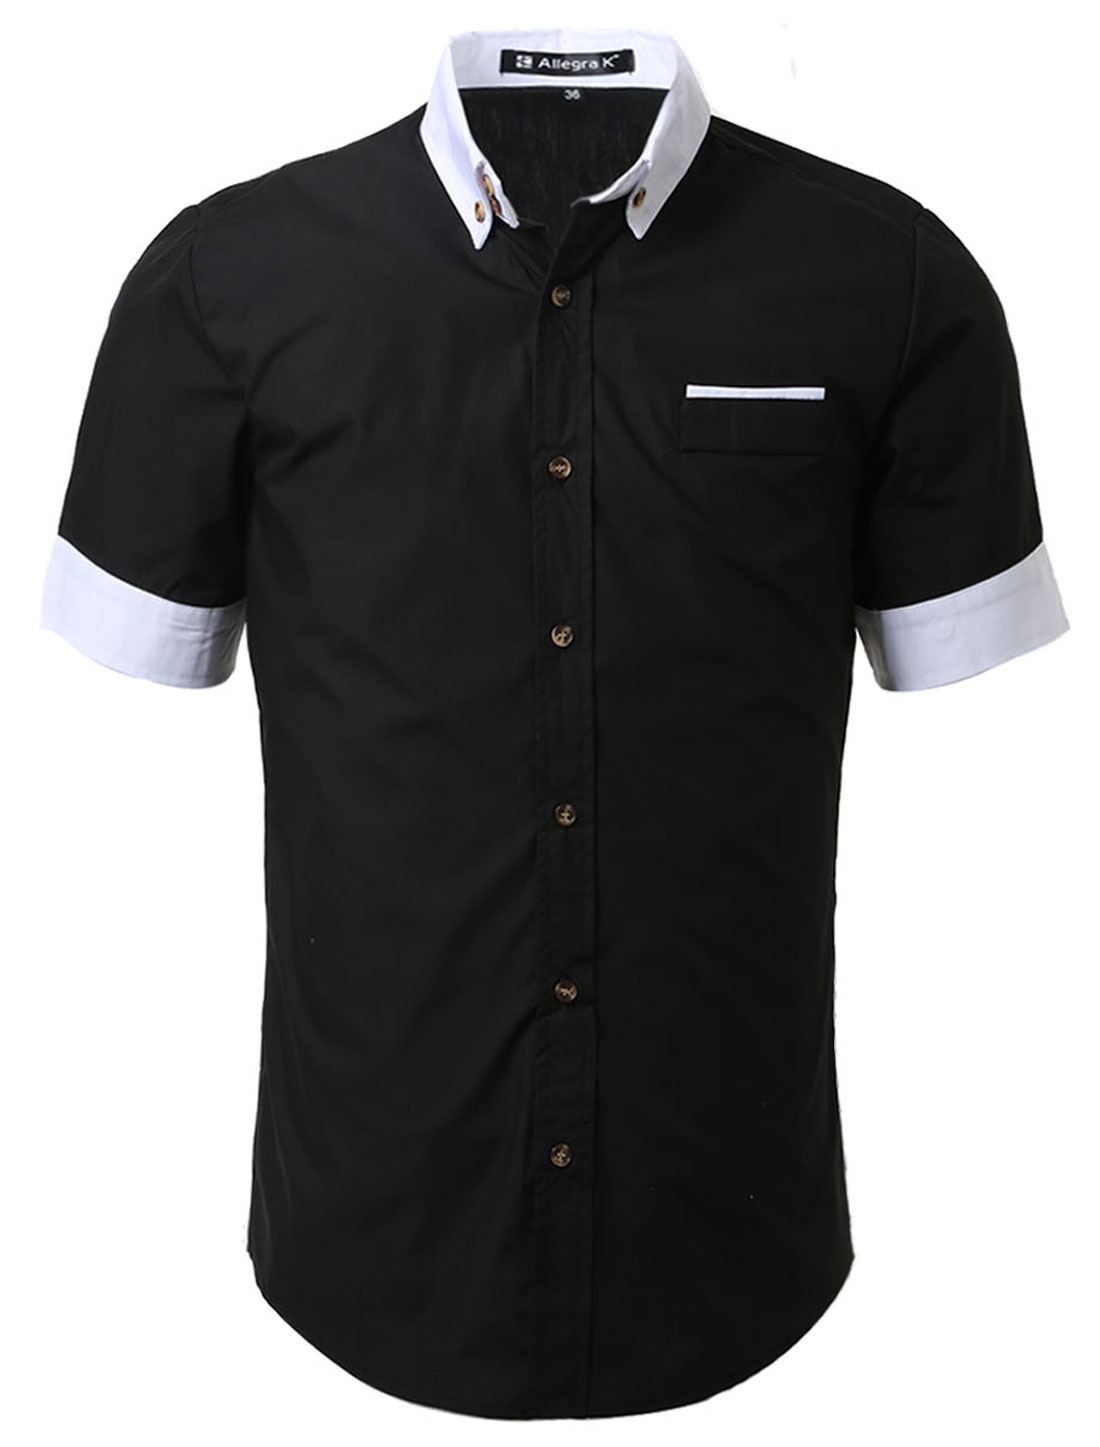 Men Casual Color Block Pocket Button Down Short Sleeve Slim Fit Shirt Black M